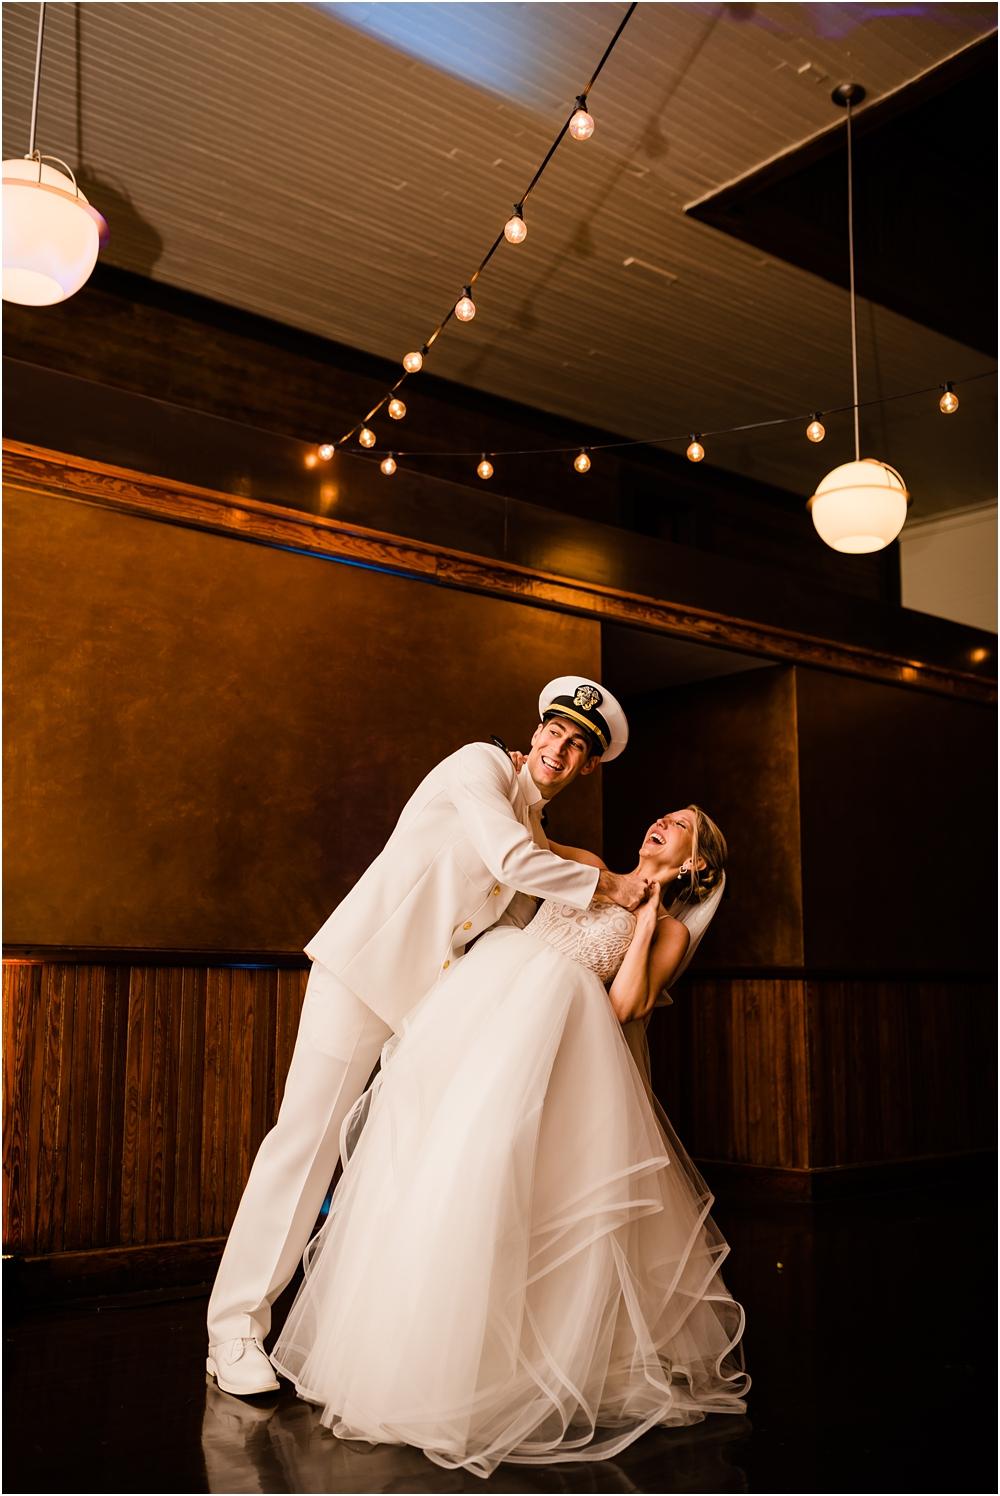 oconnor-pensacola-florida-wedding-photographer-kiersten-taylor-97.jpg